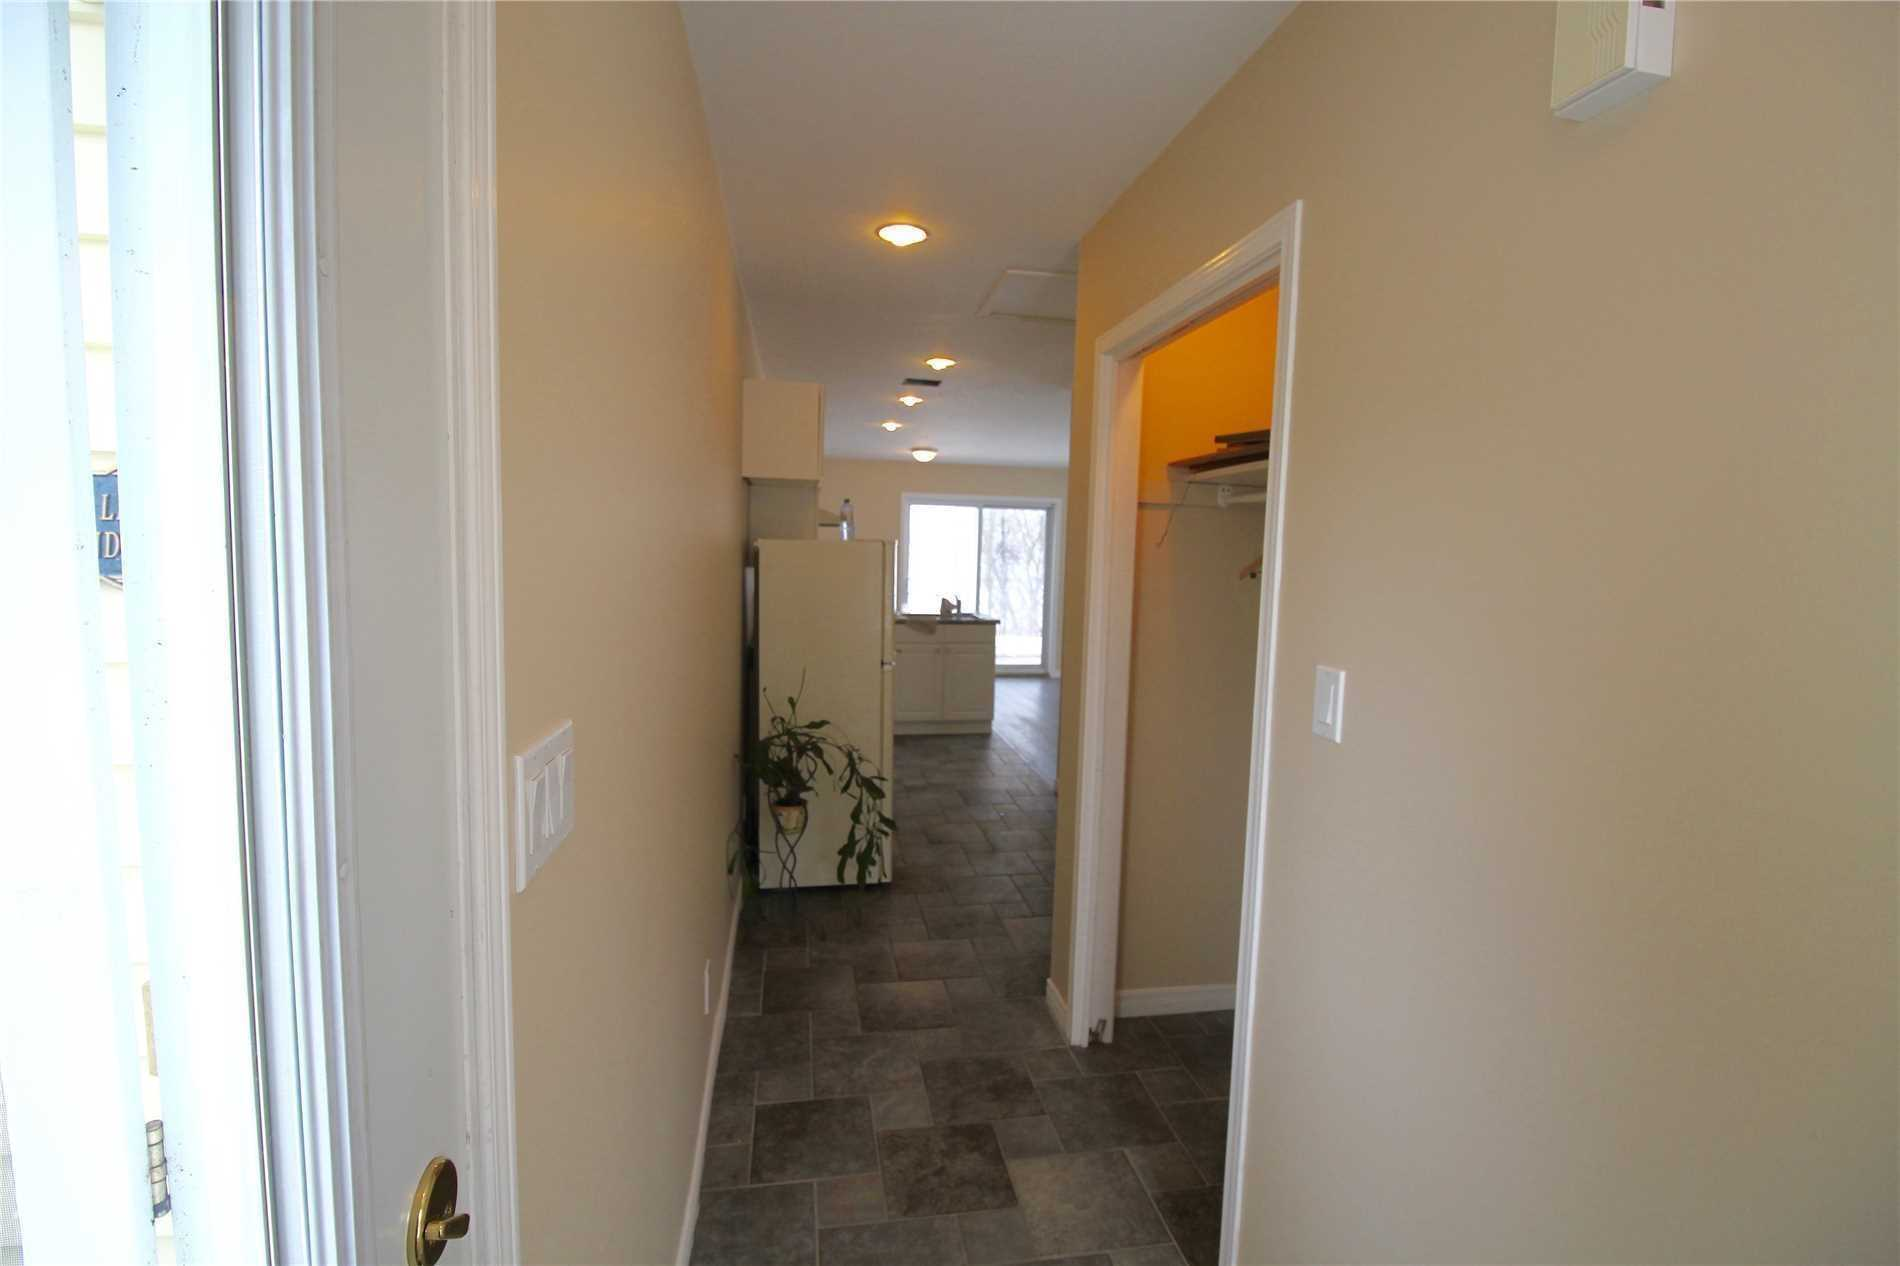 239 Champlain Rd, Penetanguishene S4518099